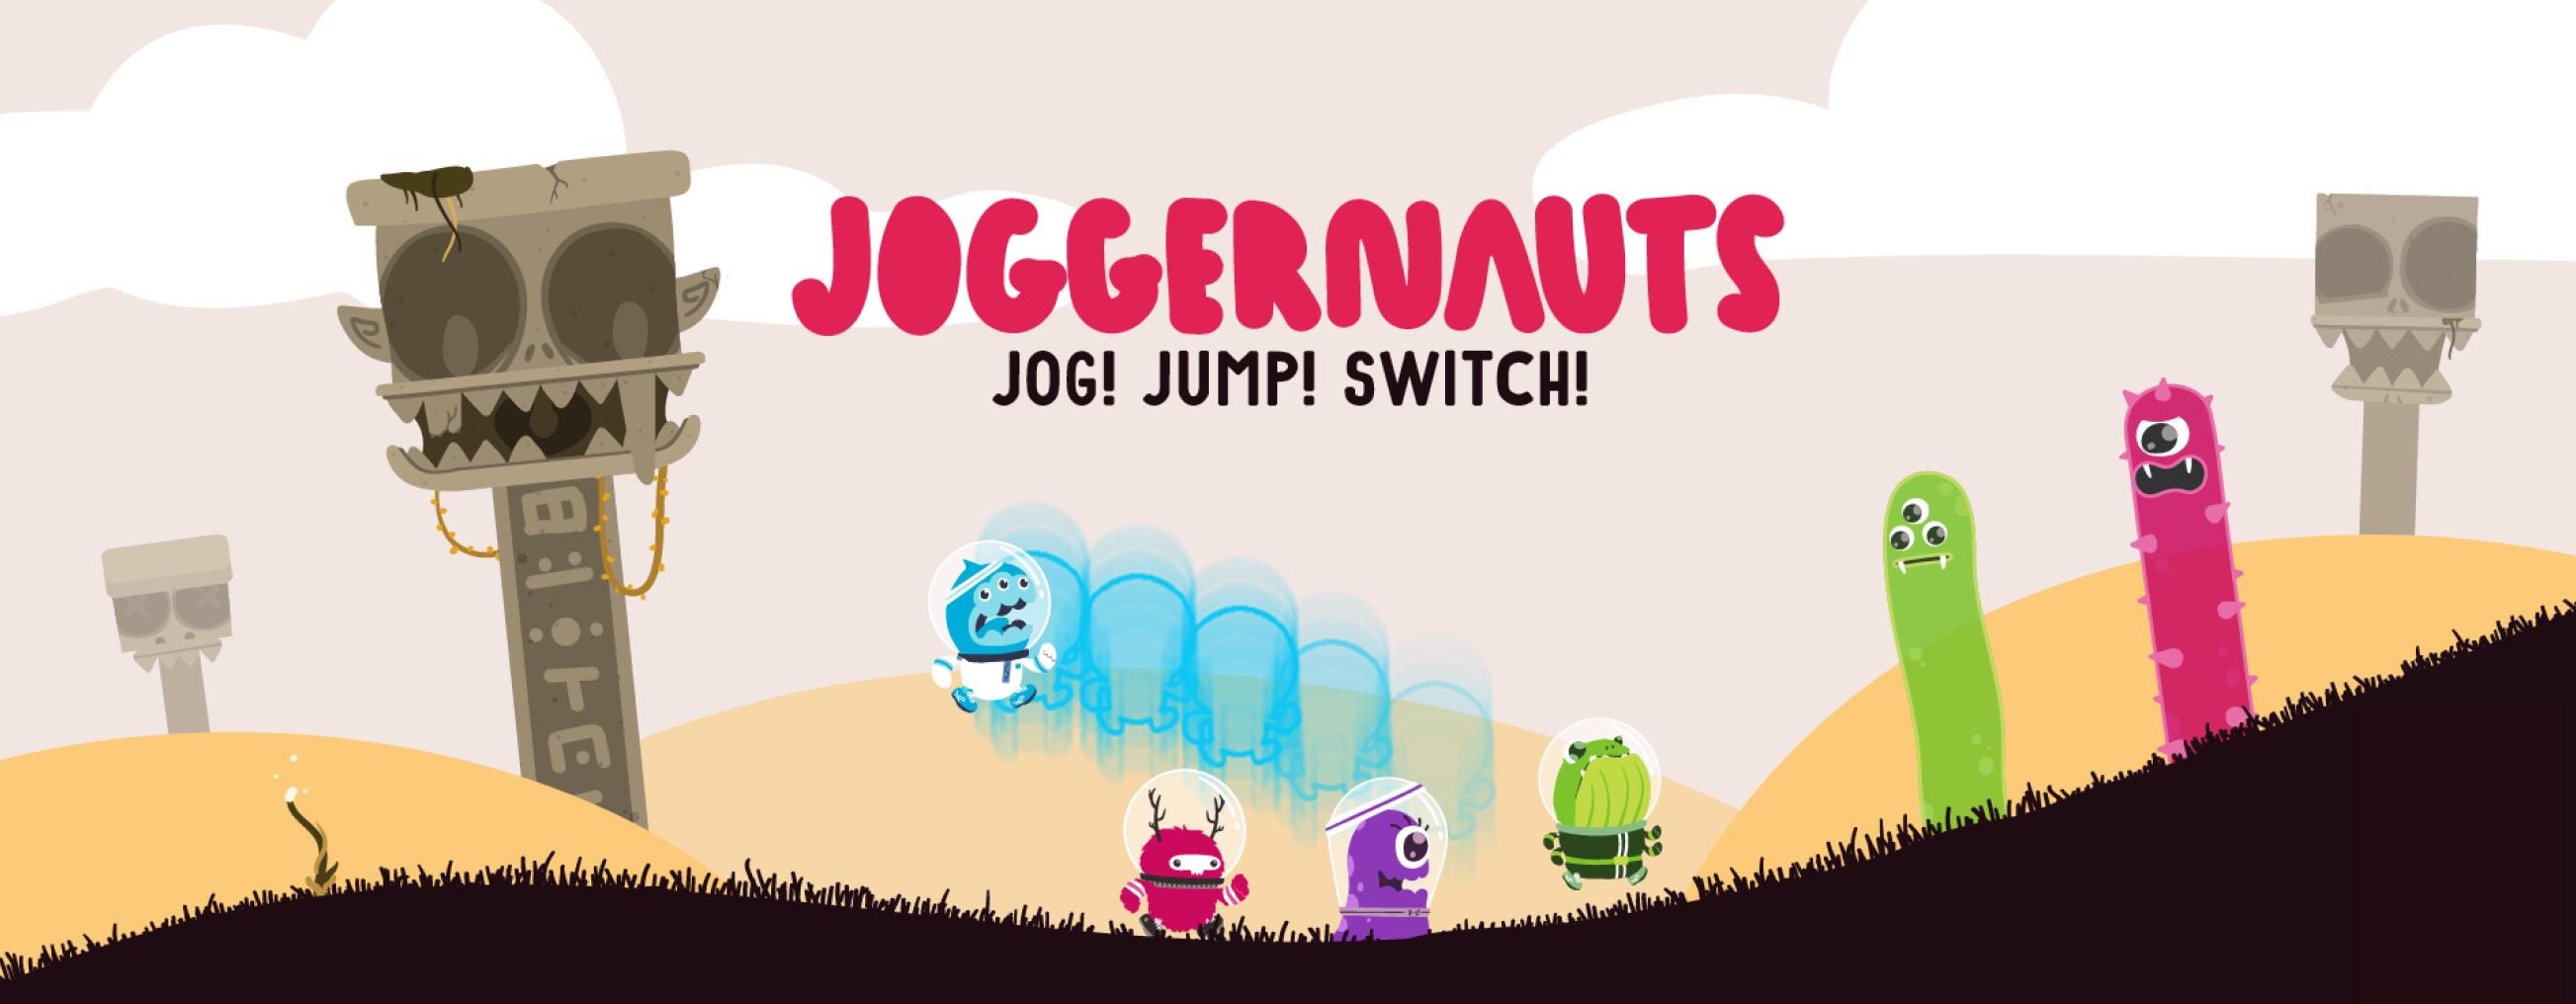 joggernauts header V2